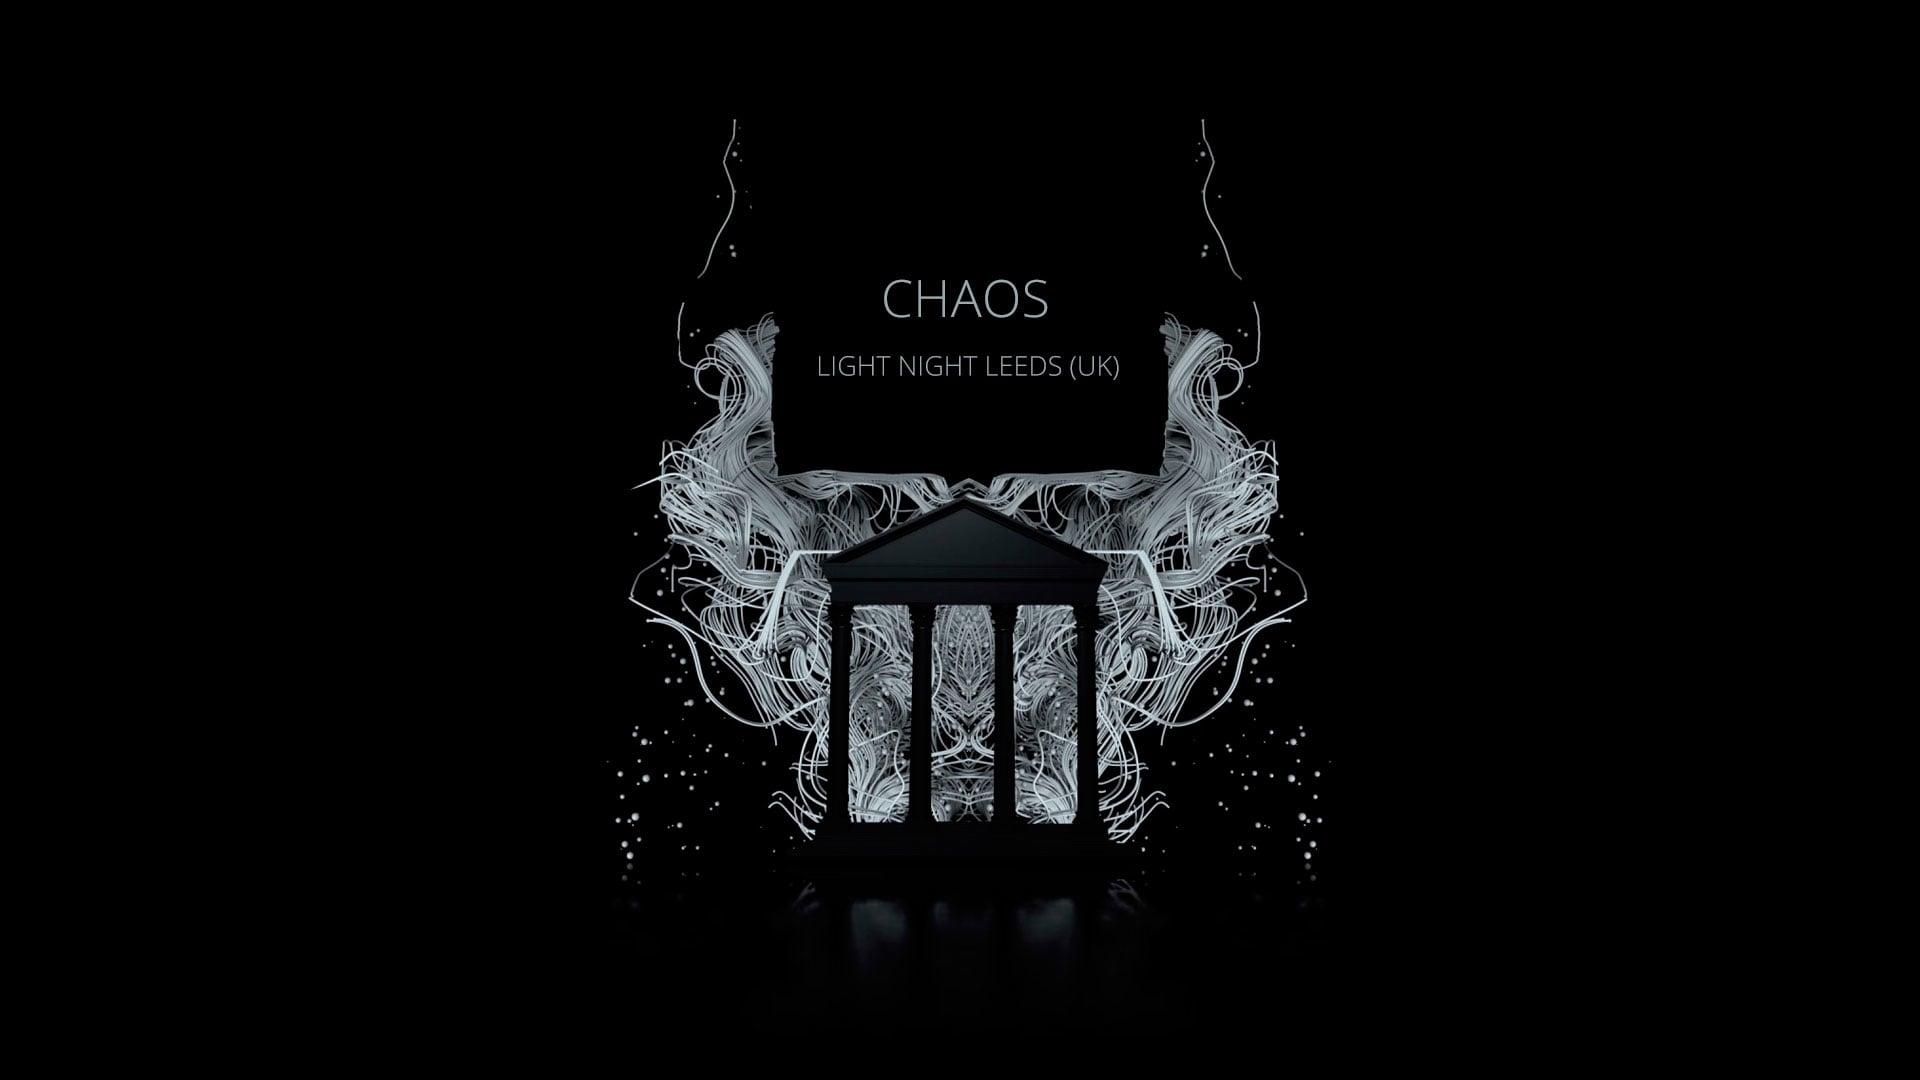 Chaos, Light Night Leeds Festival 2018